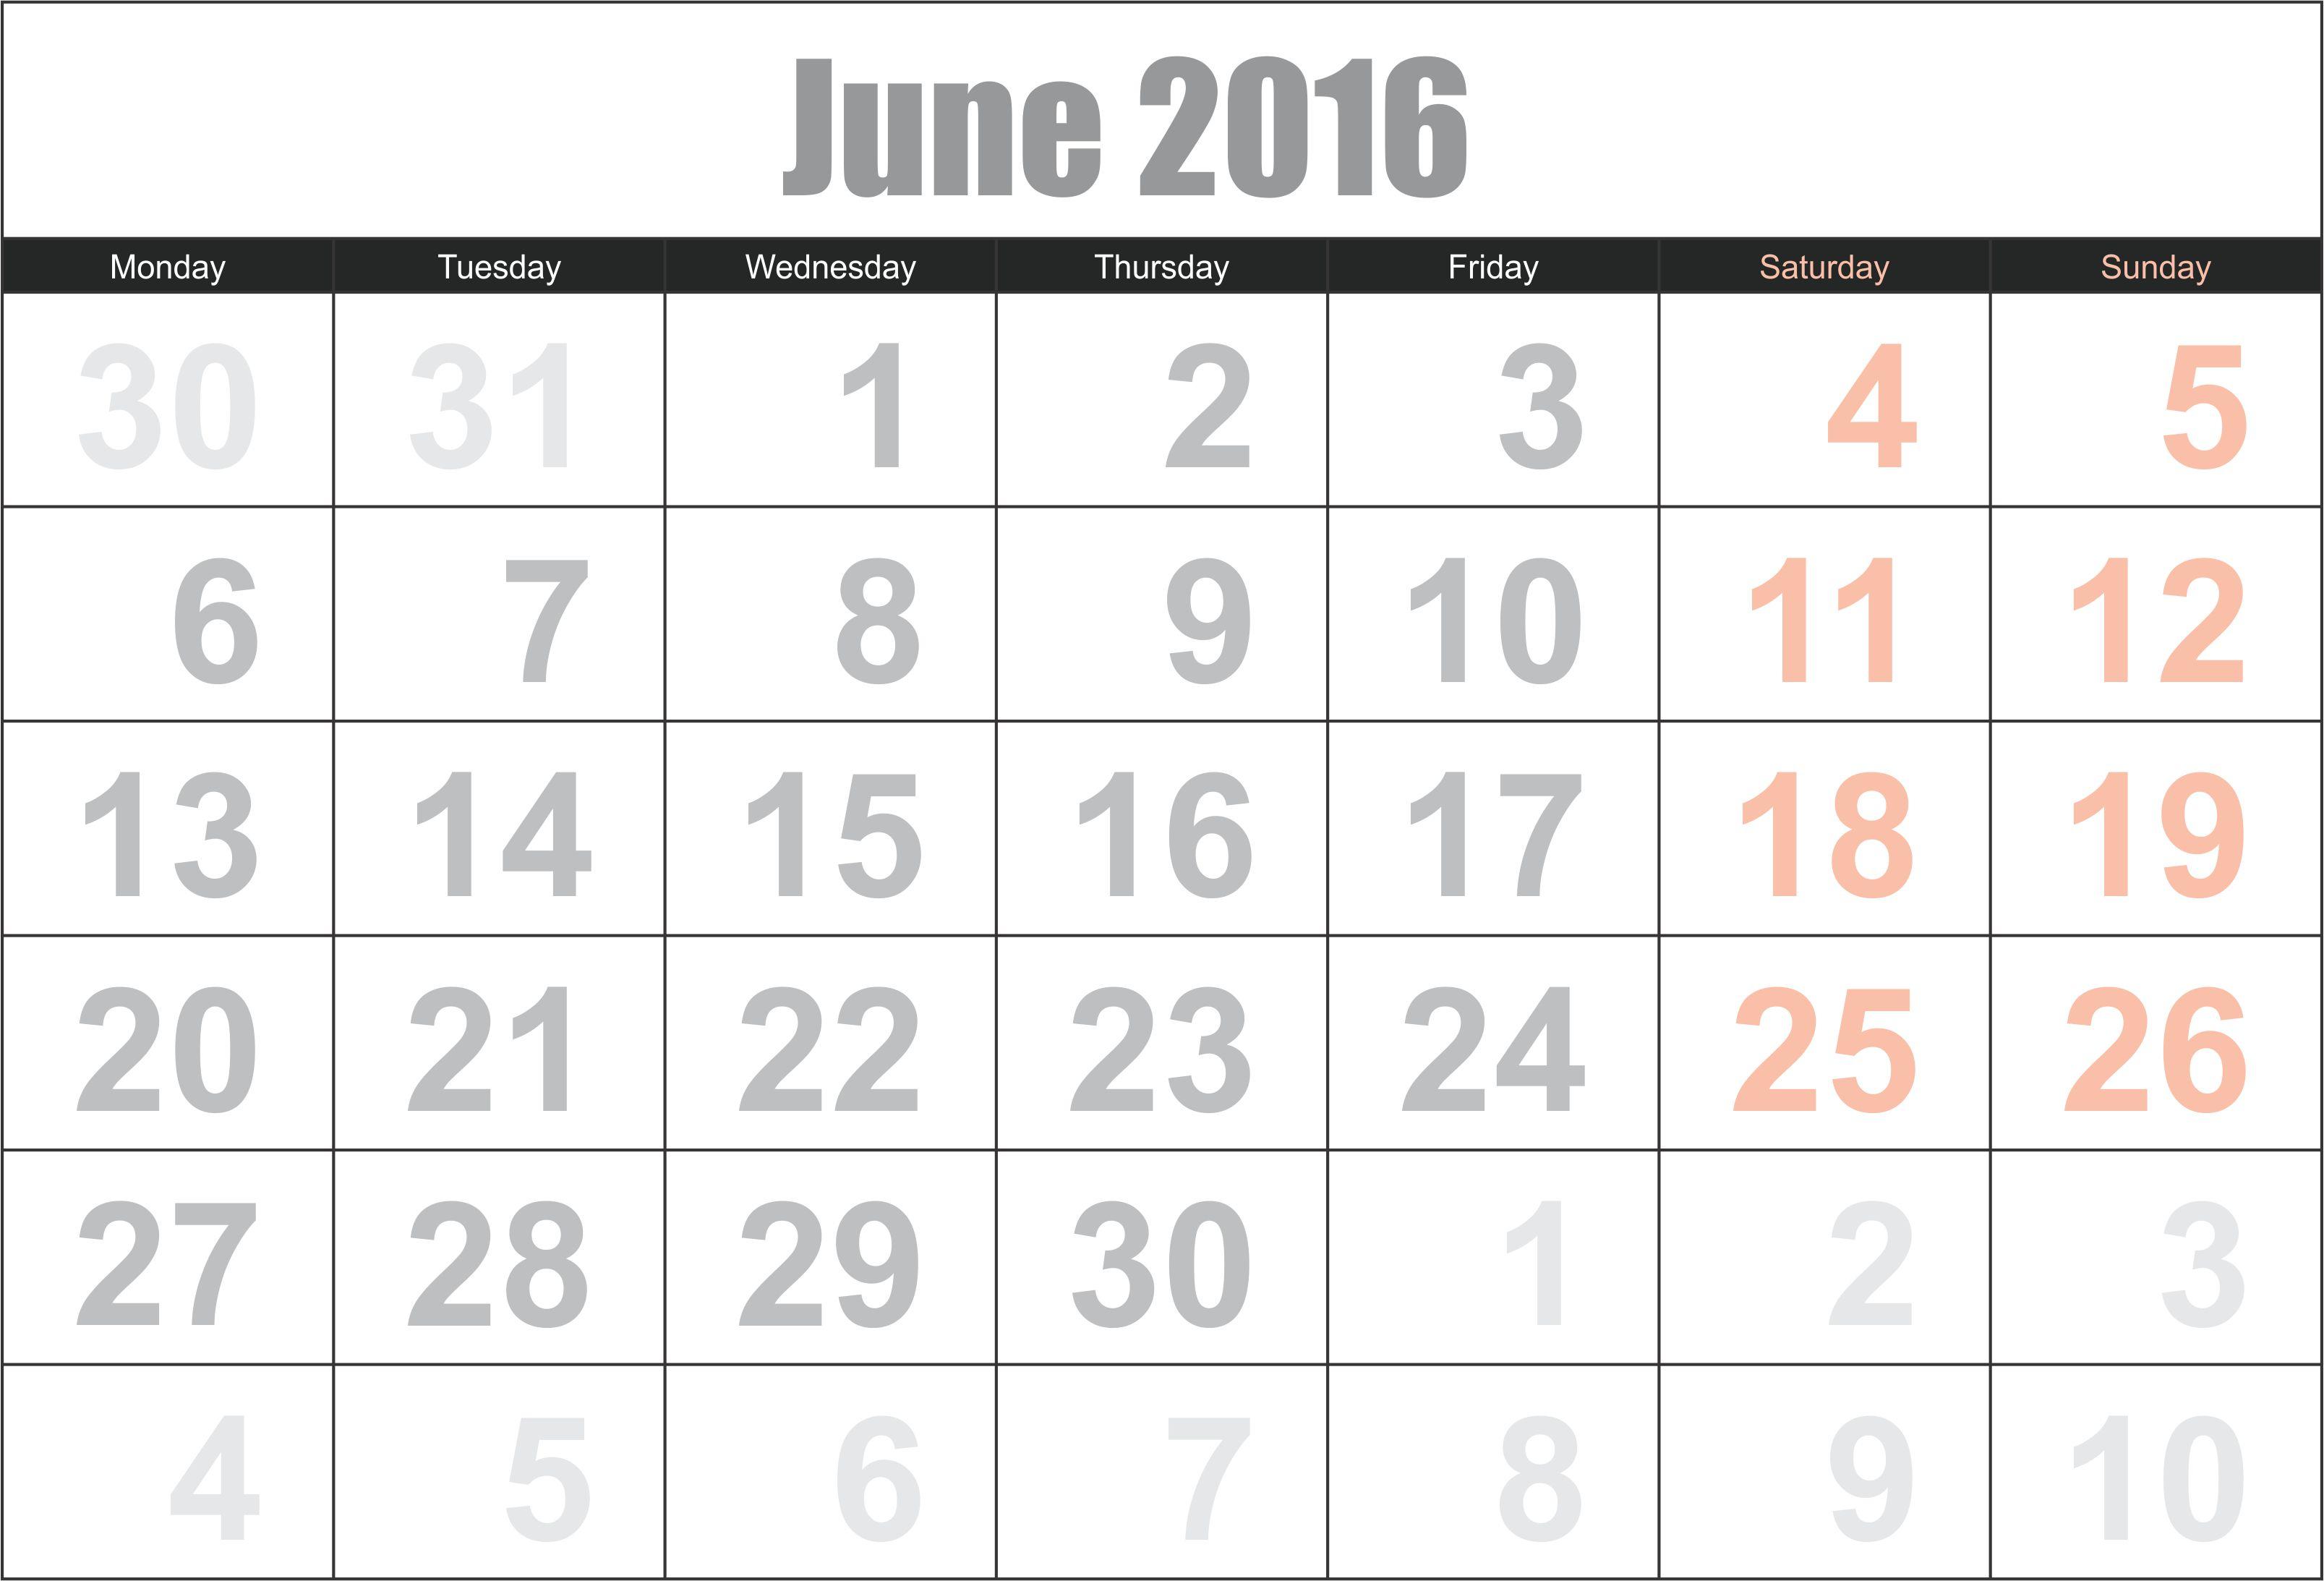 2016 June Calendar  Printable Calendar Template 2020 2021 regarding June 2016 Calendar Printable